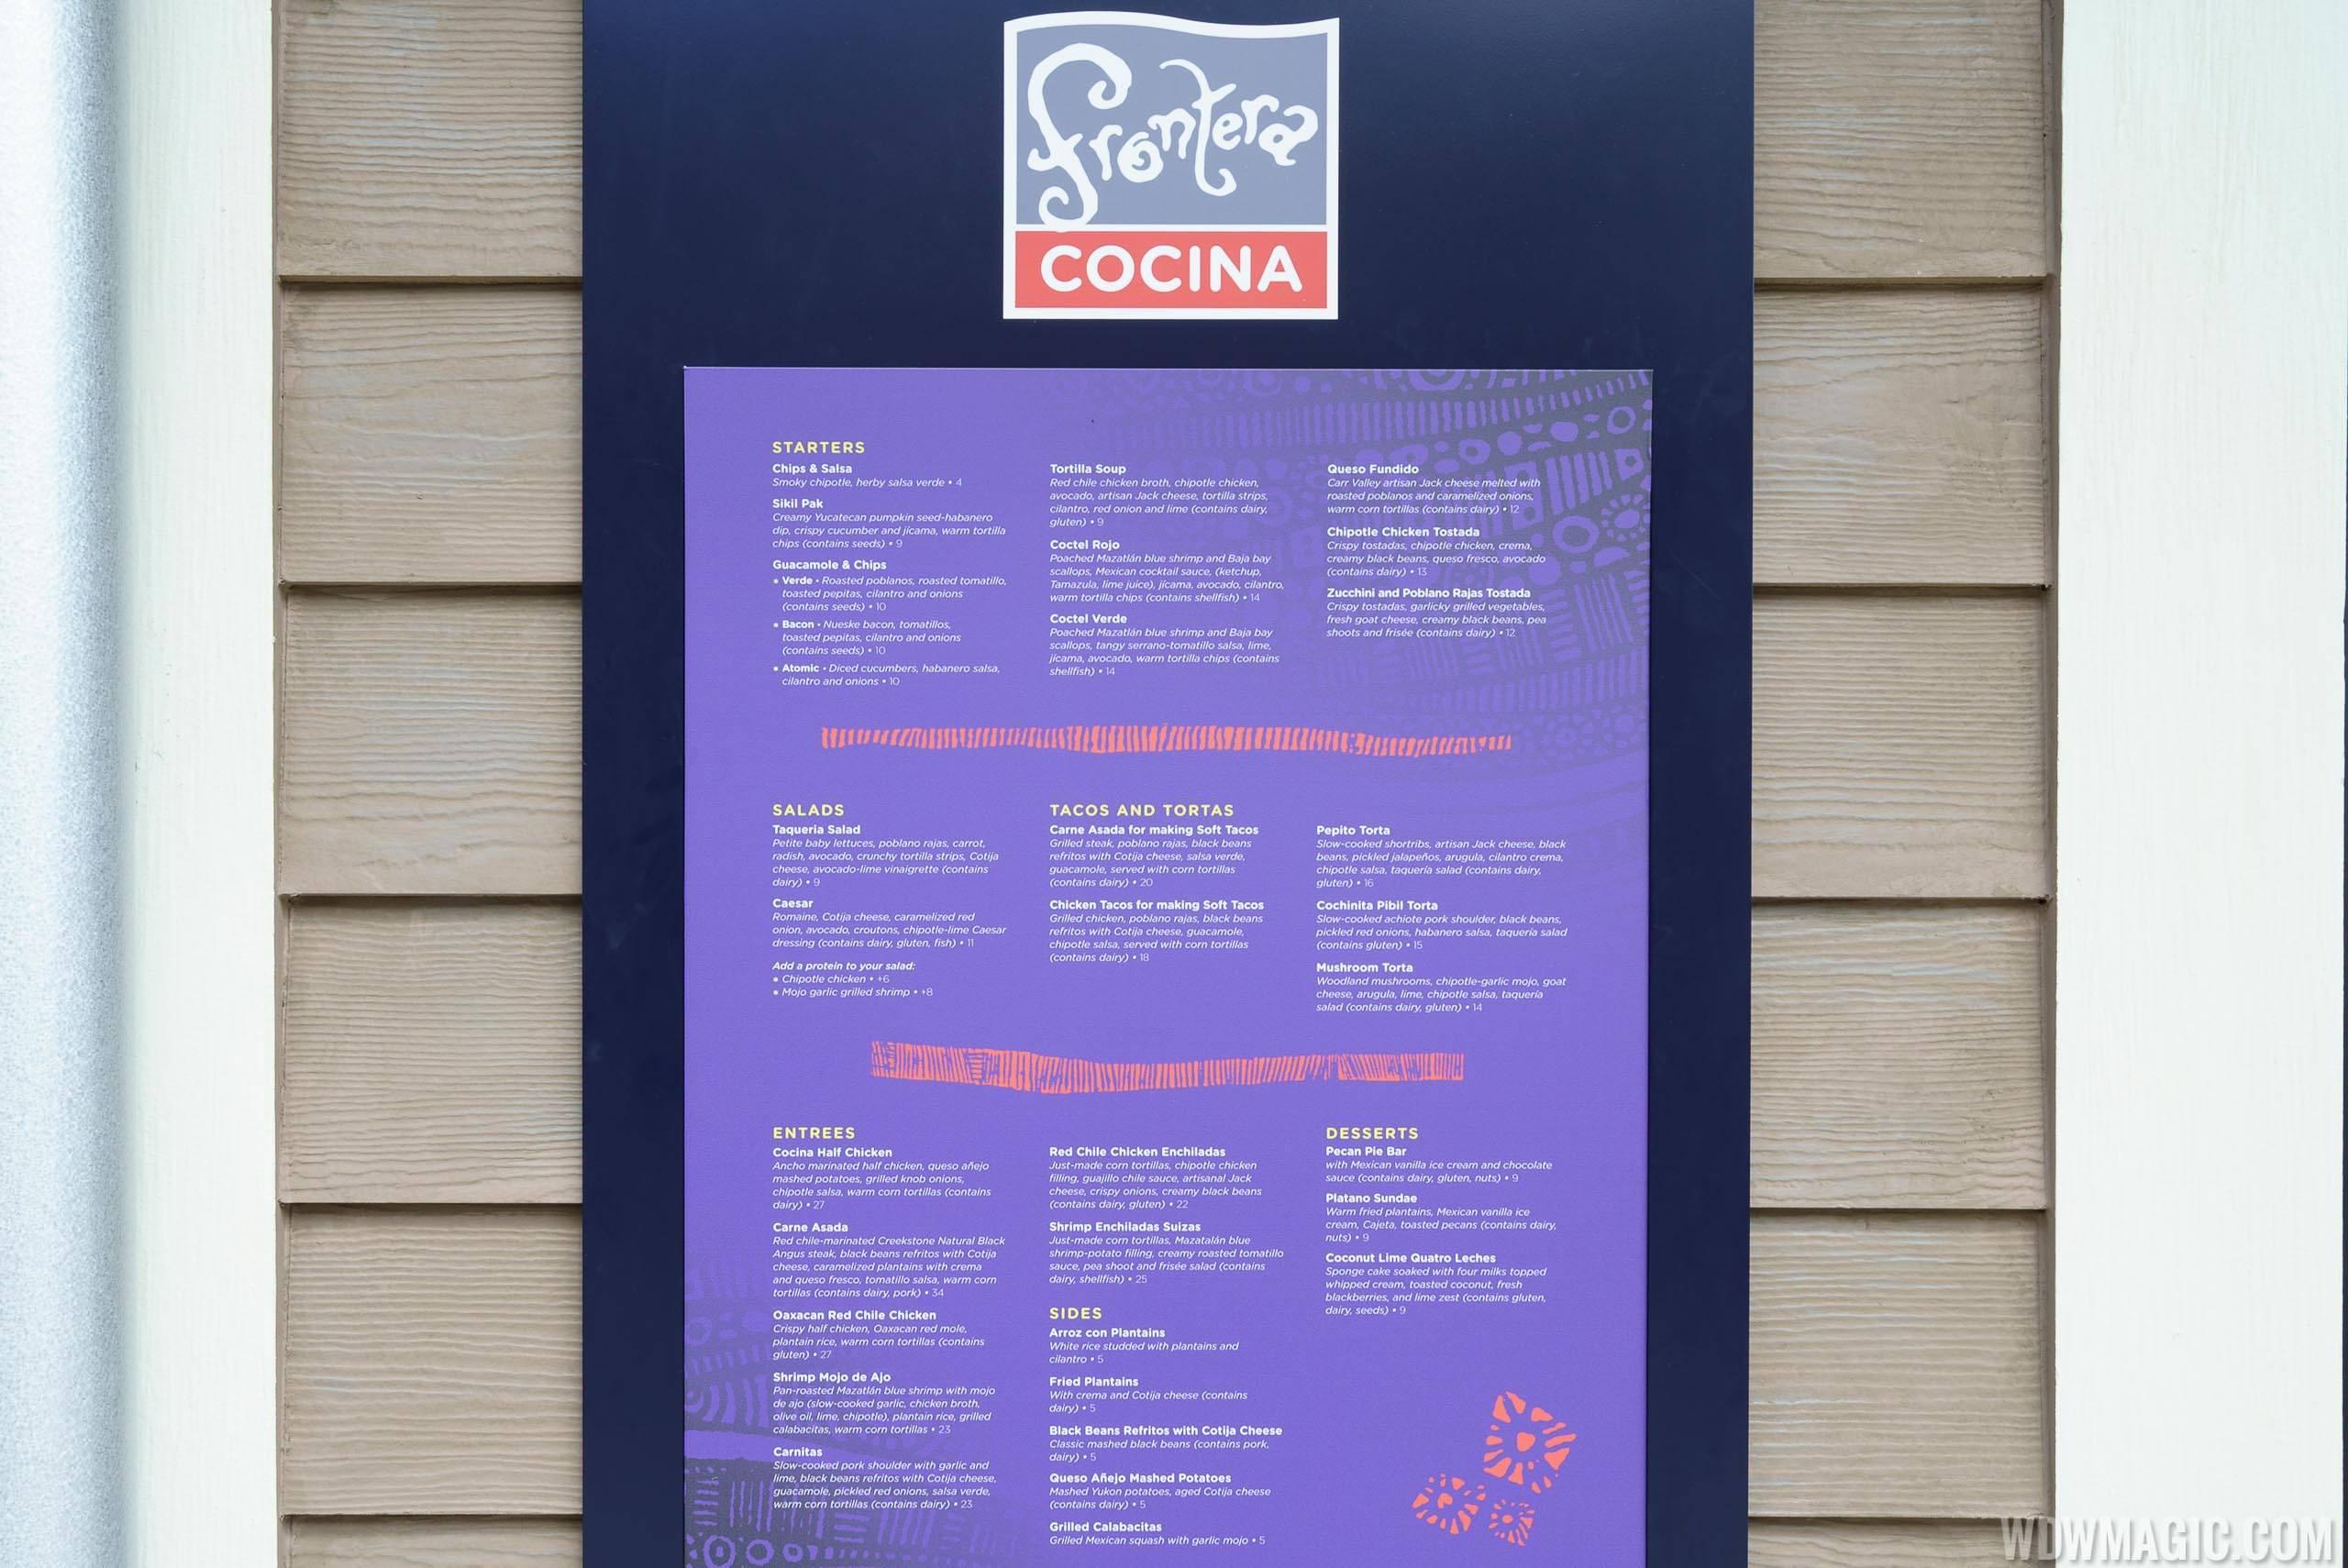 Frontera Cocina overview